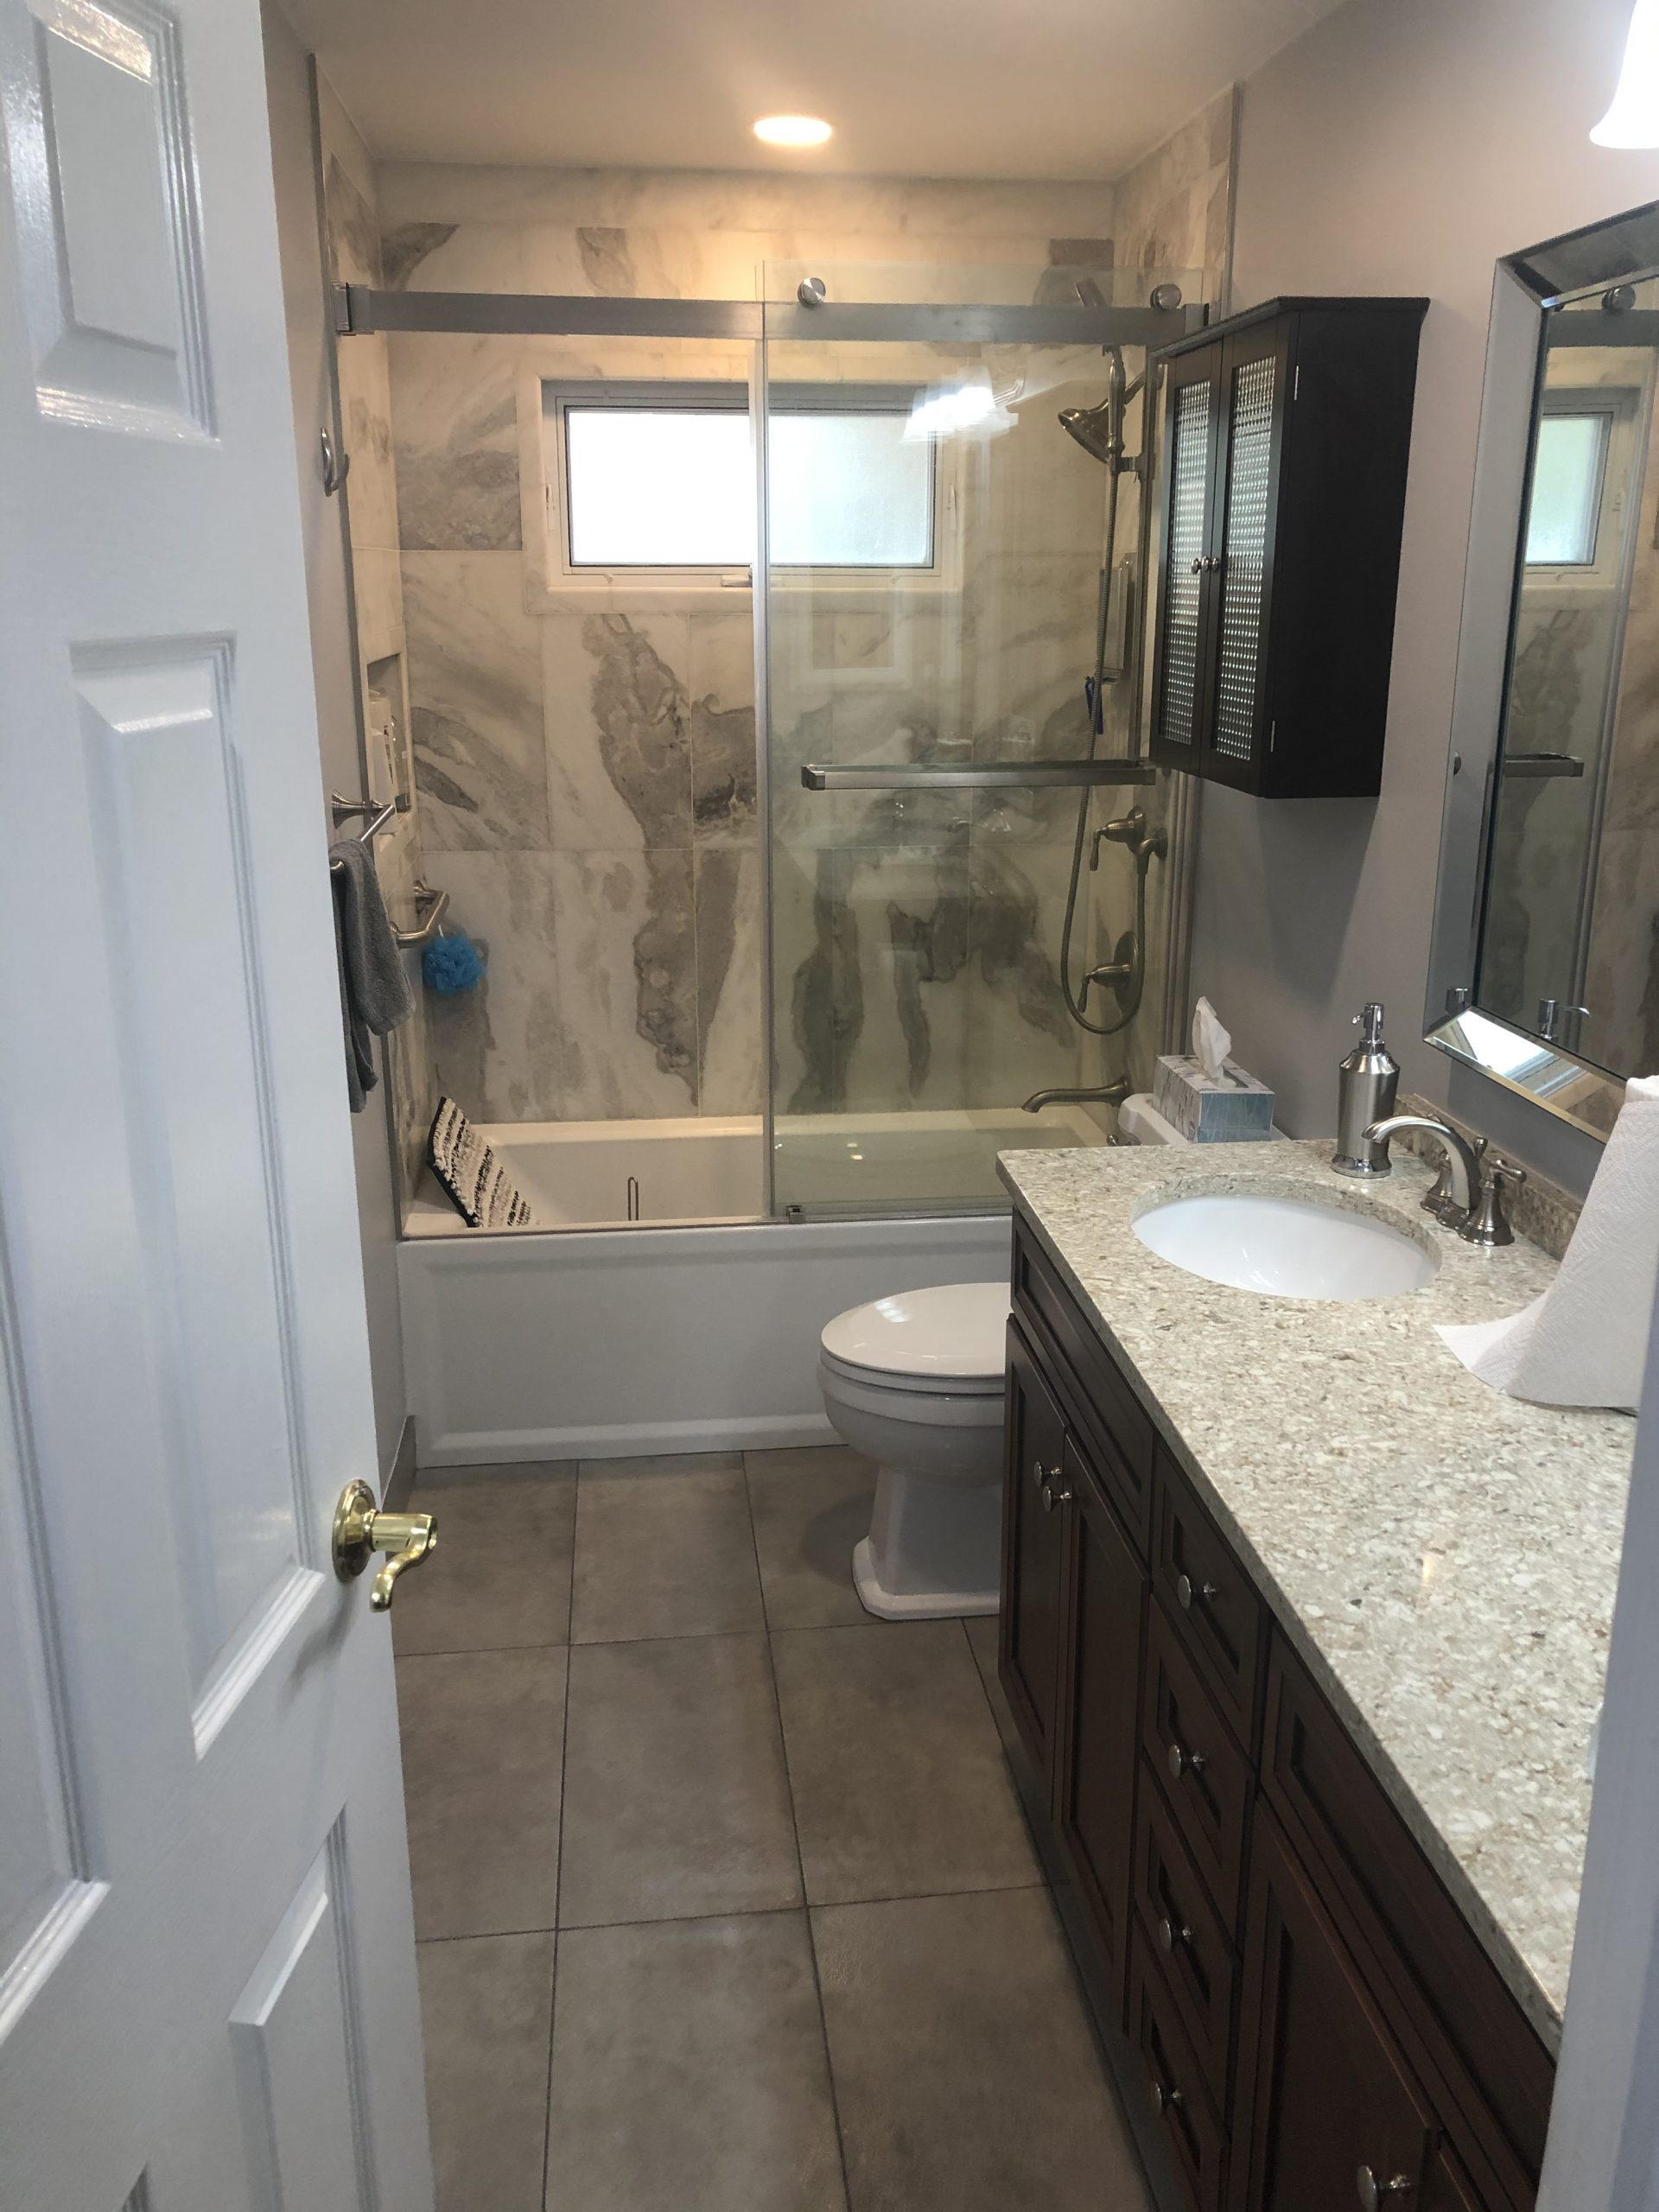 after Hoffman Estates il bathroom